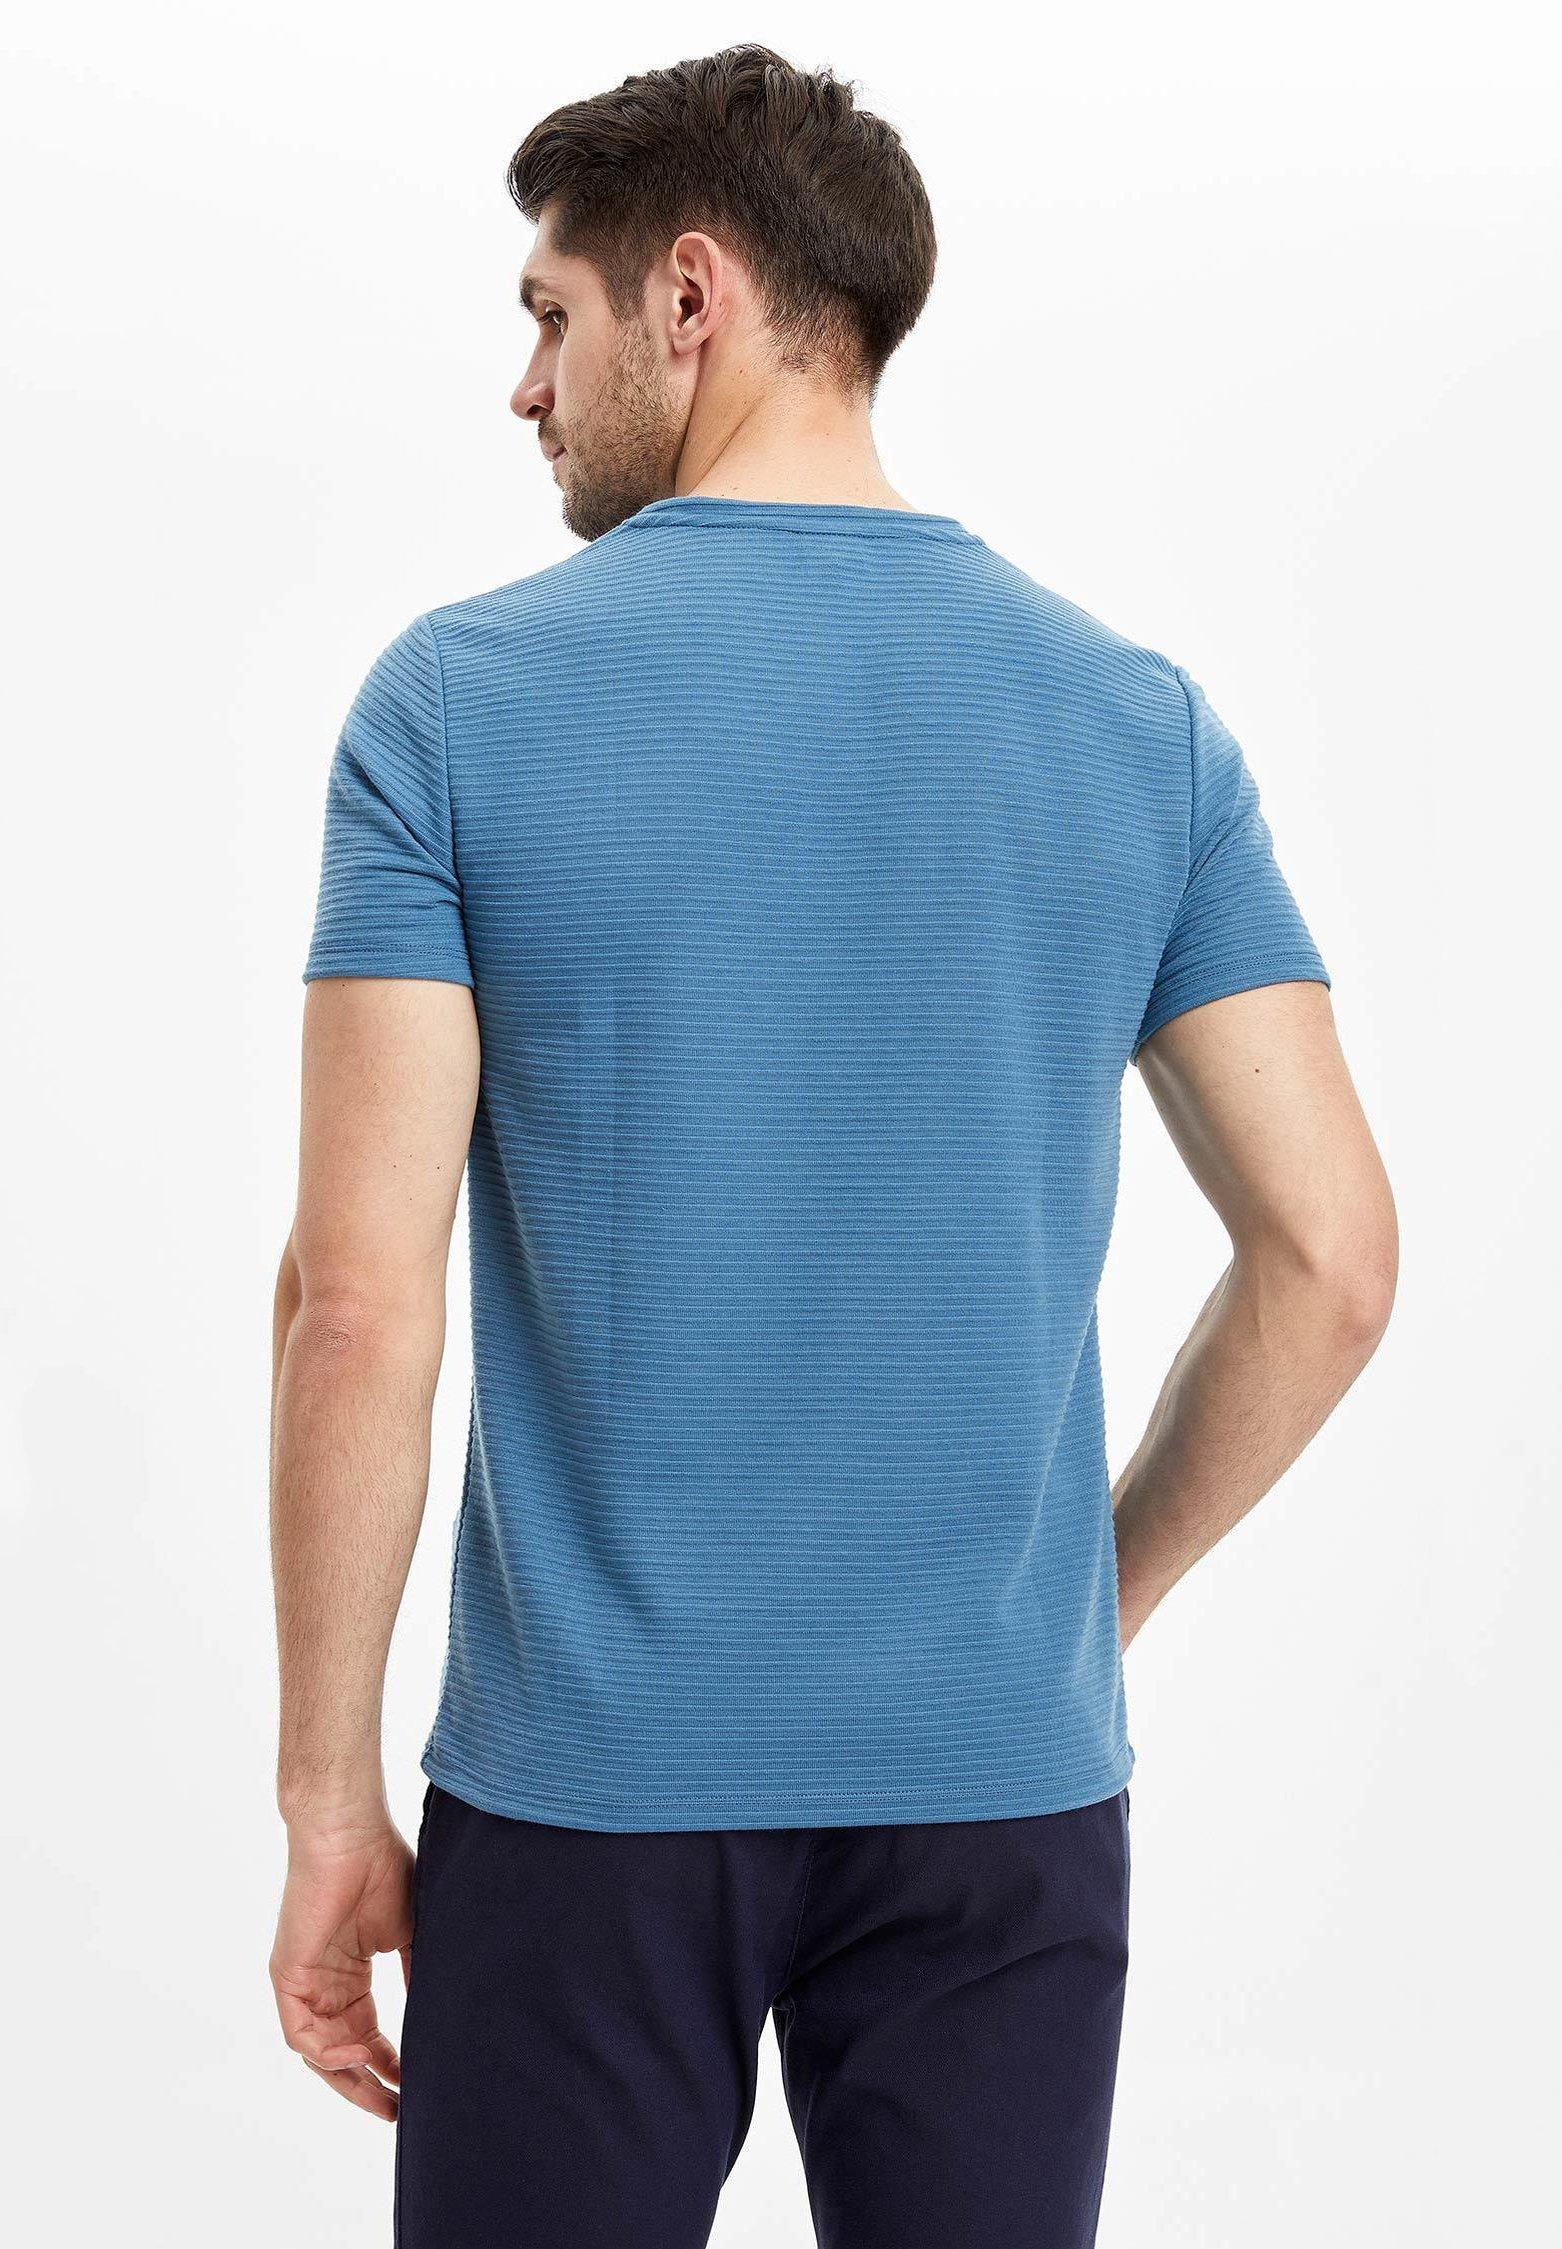 DeFacto Basic T-shirt - blue GptPH